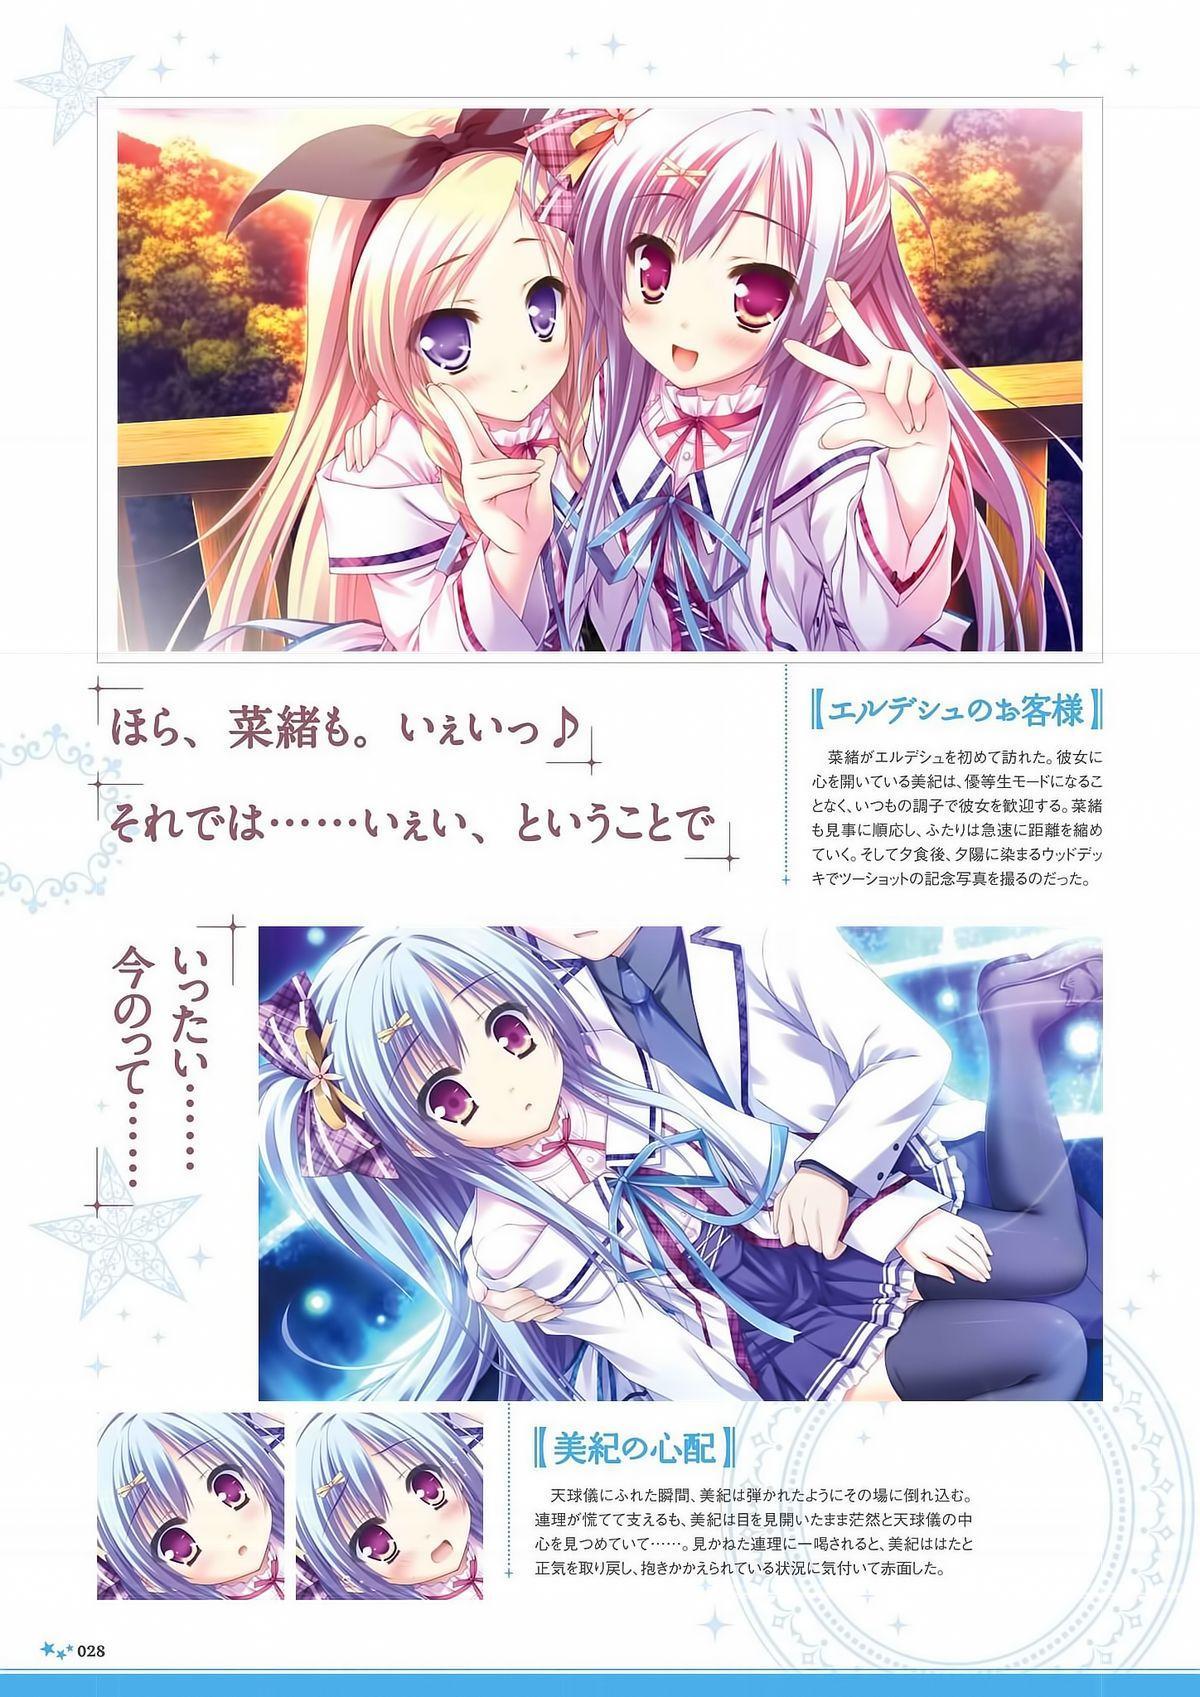 Sekai to Sekai no Mannaka de Visual Fanbook 29